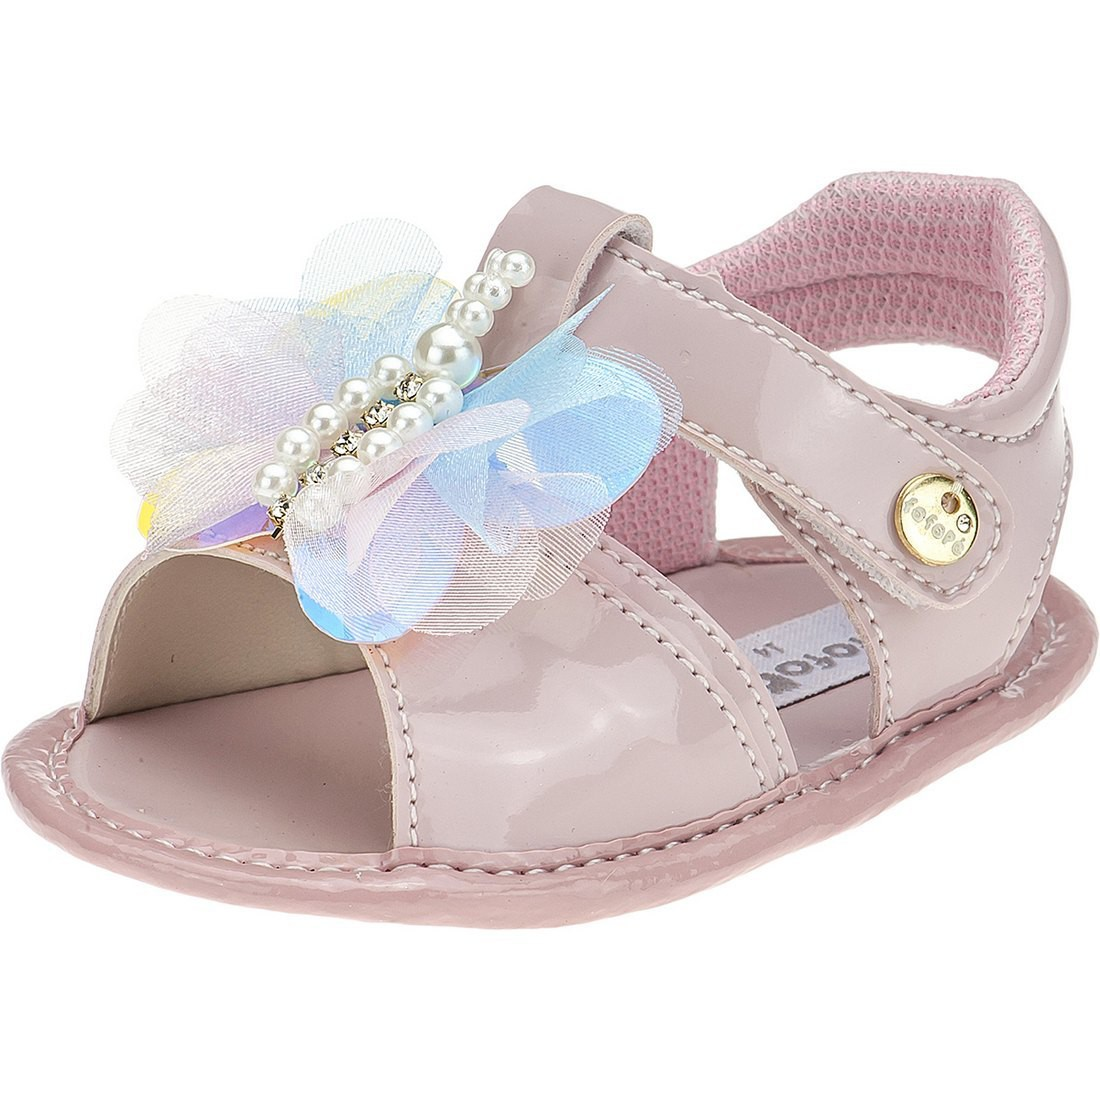 Sandália Baby Menina Fofopé Borboletas Rosê